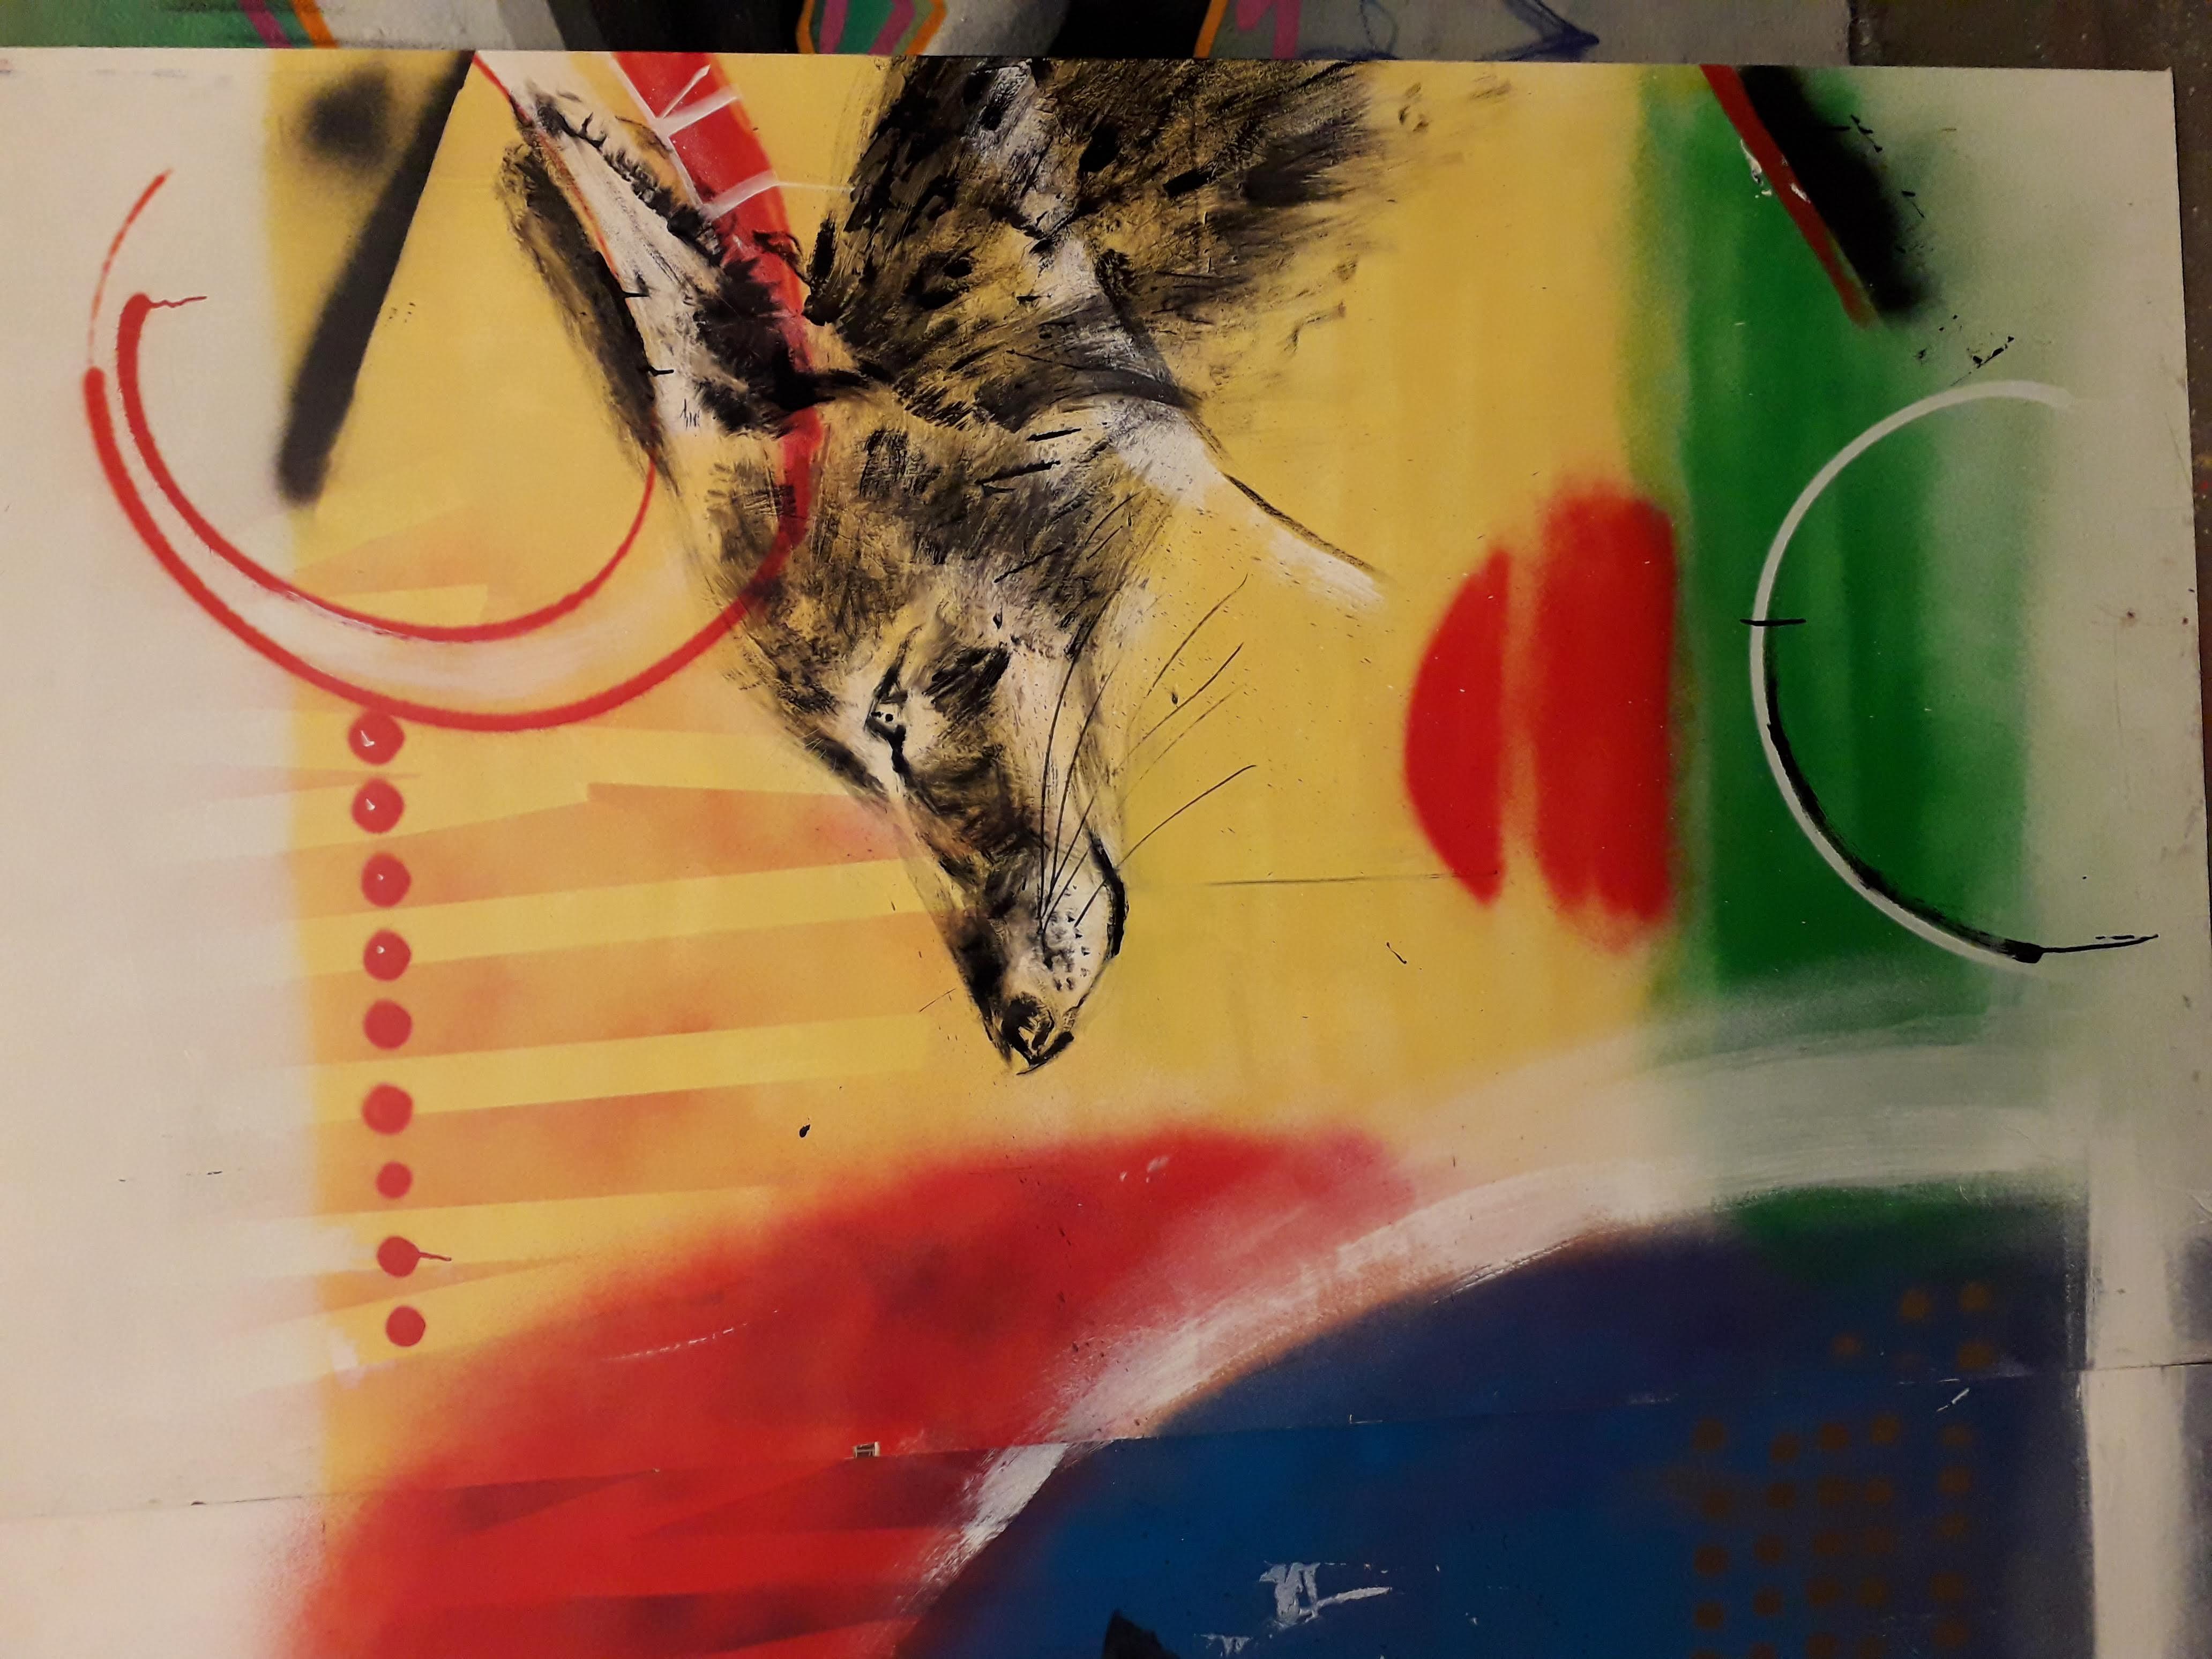 South Africa themed bar mural